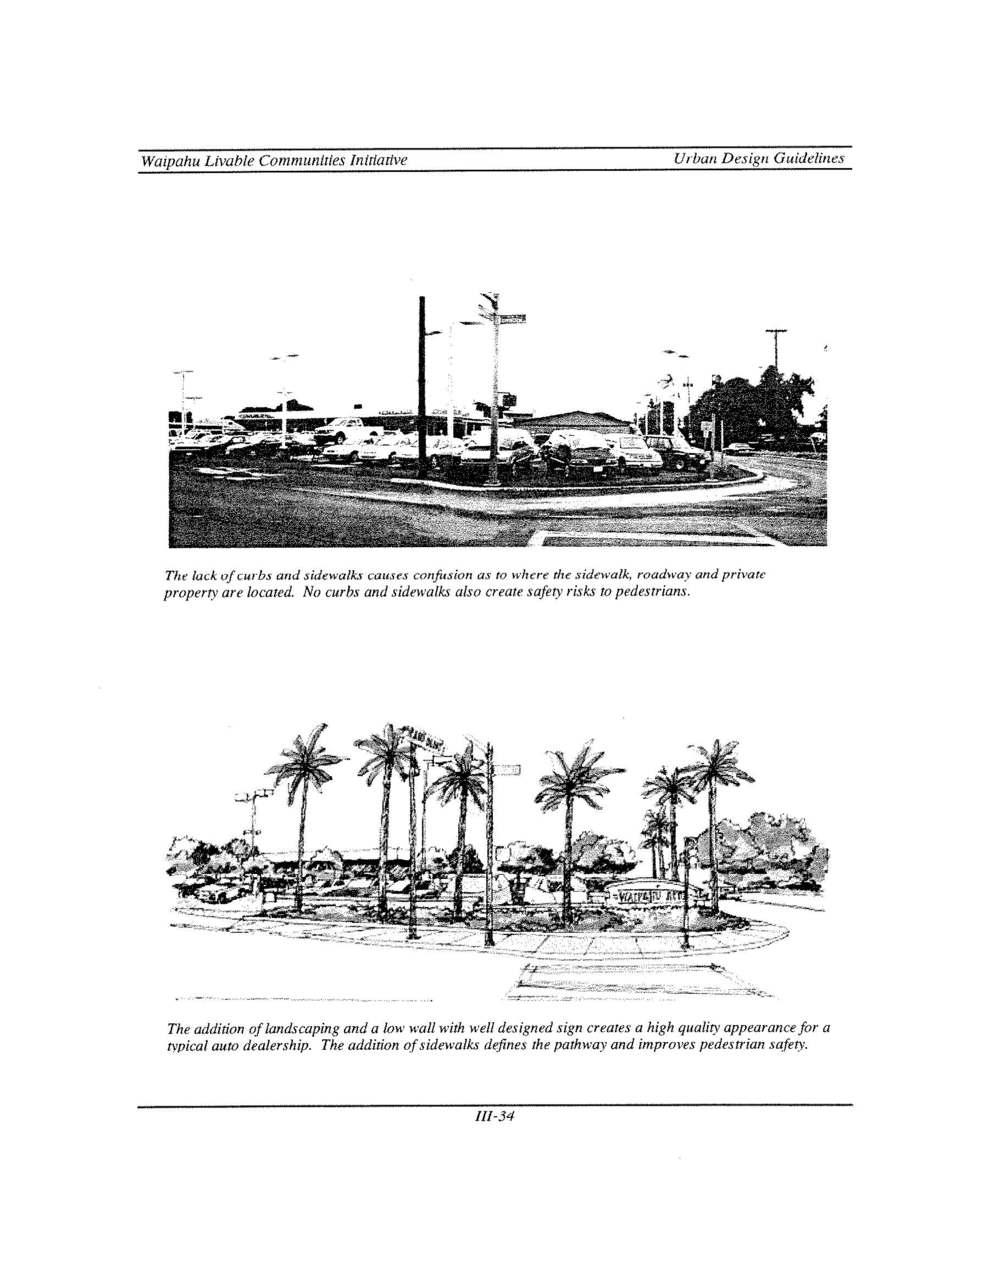 160531_WaipahuLivableCommunities(1998)_Page_124.jpg